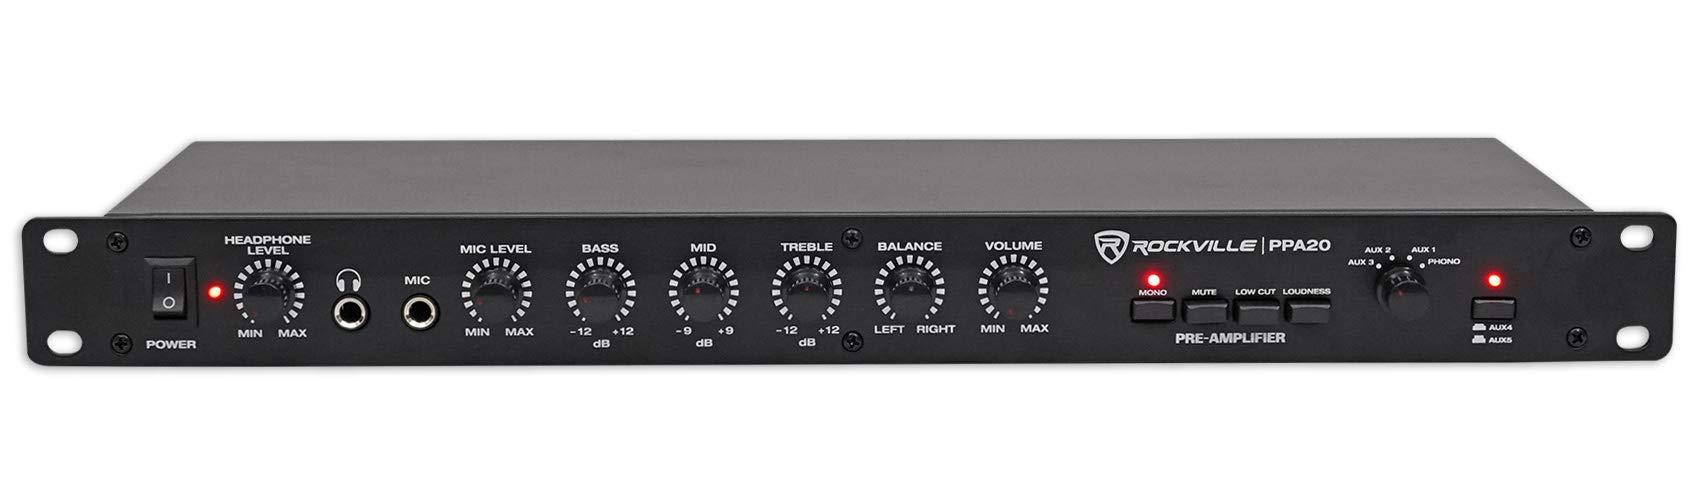 Rockville PPA20 Home Audio Preamp Pre-Amplifier w/Crossover+EQ